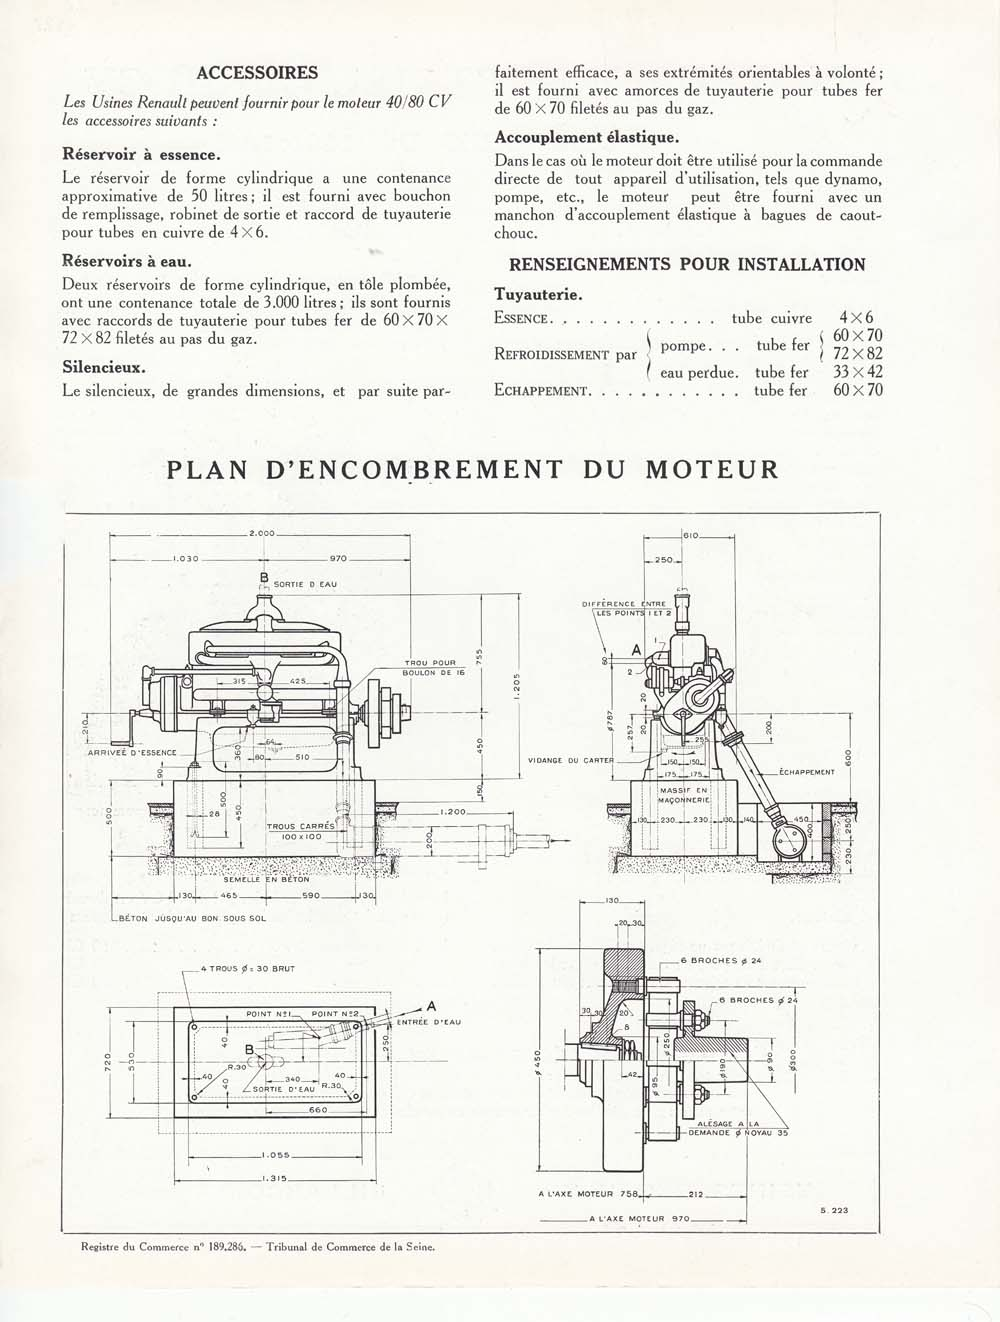 moteur_industriel_40_80cv_6cyl_2